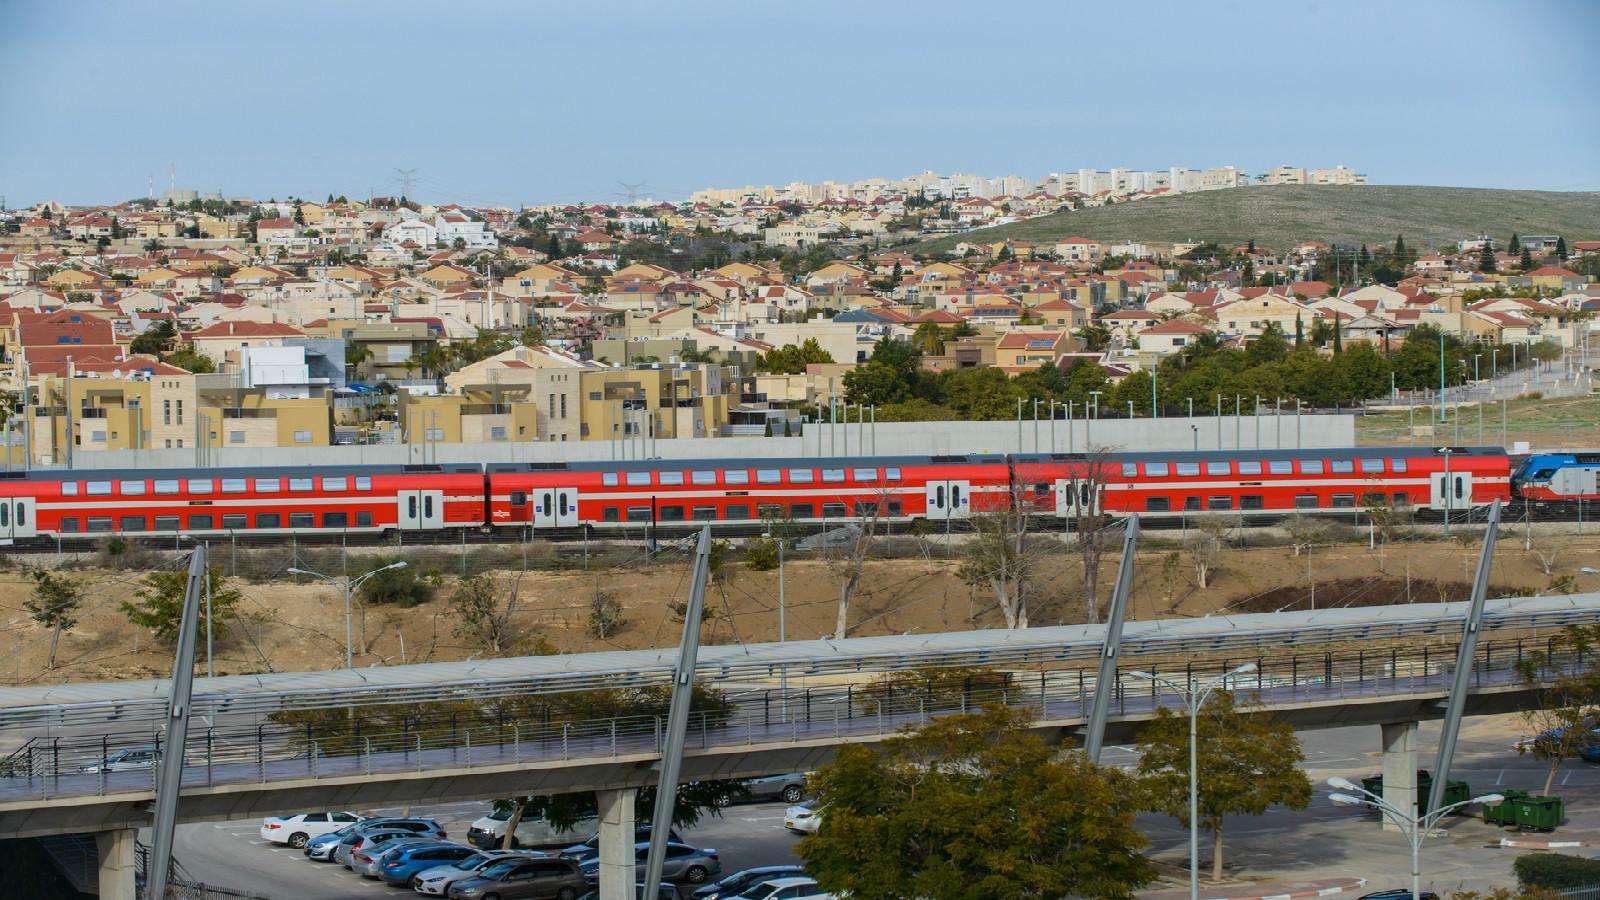 An Israel Railways train passes next to Beersheva's Mexico Bridge. Photo by Dani Machlis/BGU